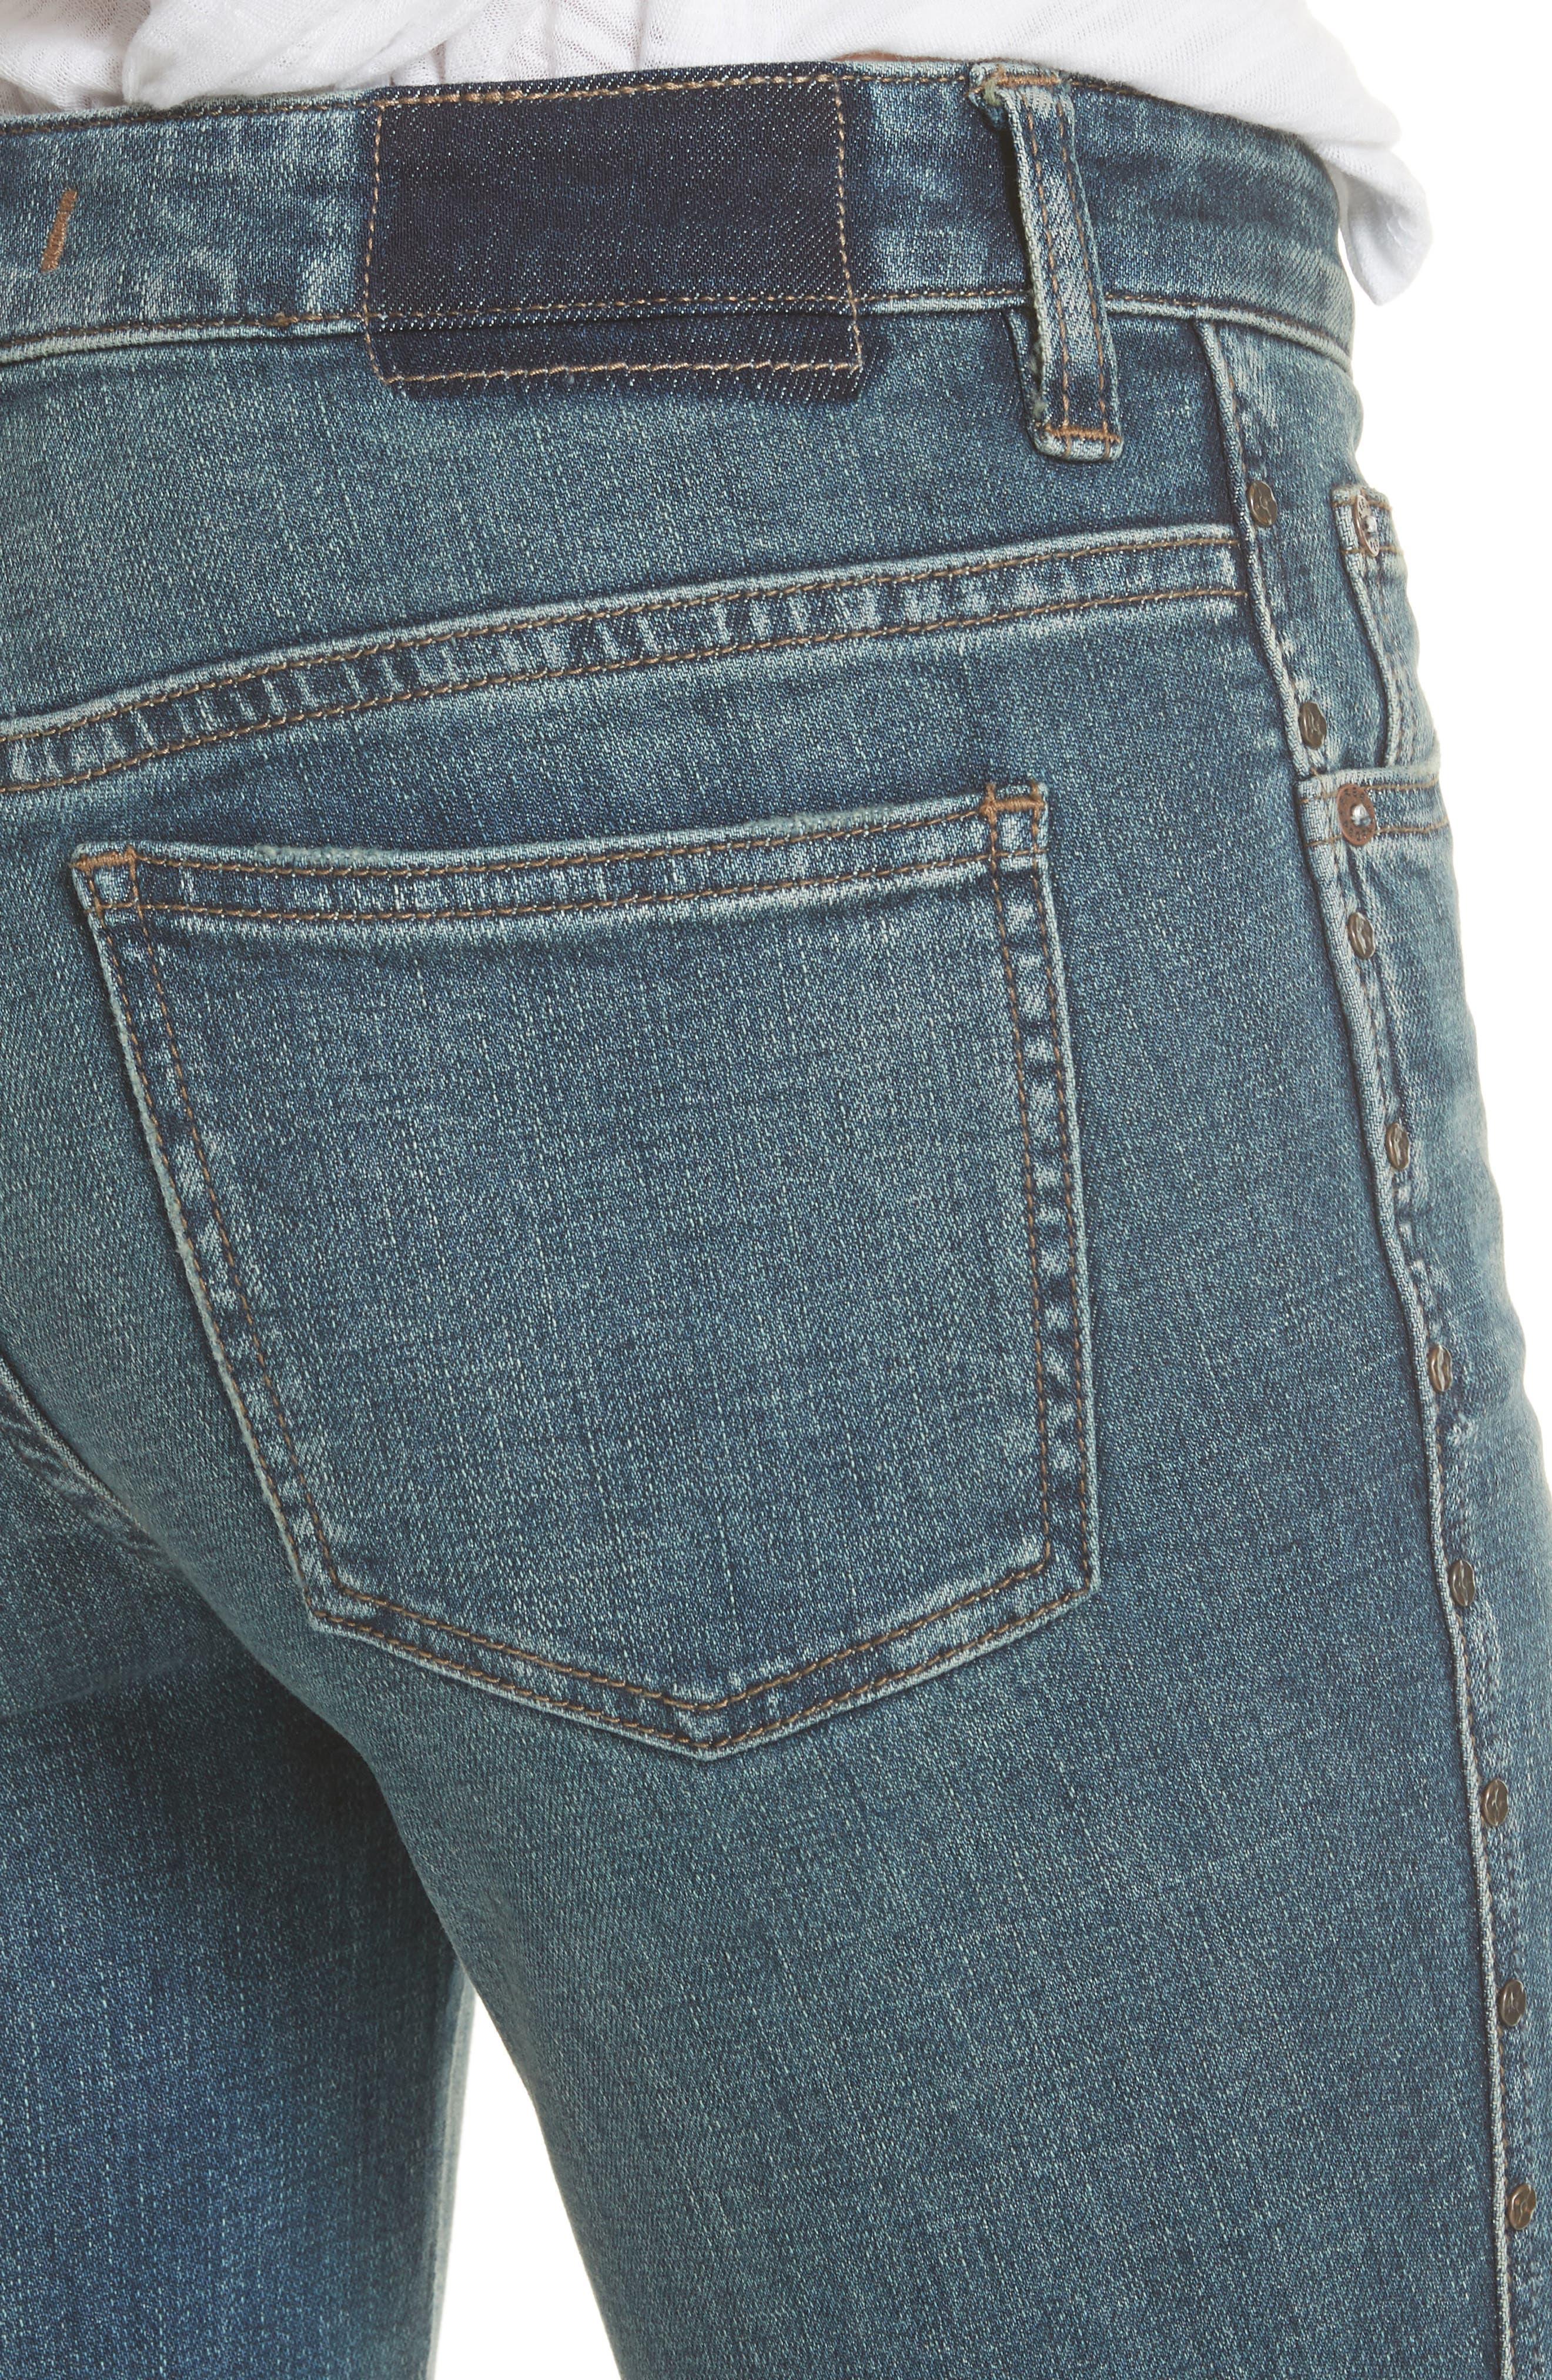 Studded Crop Flare Jeans,                             Alternate thumbnail 4, color,                             Dark Denim